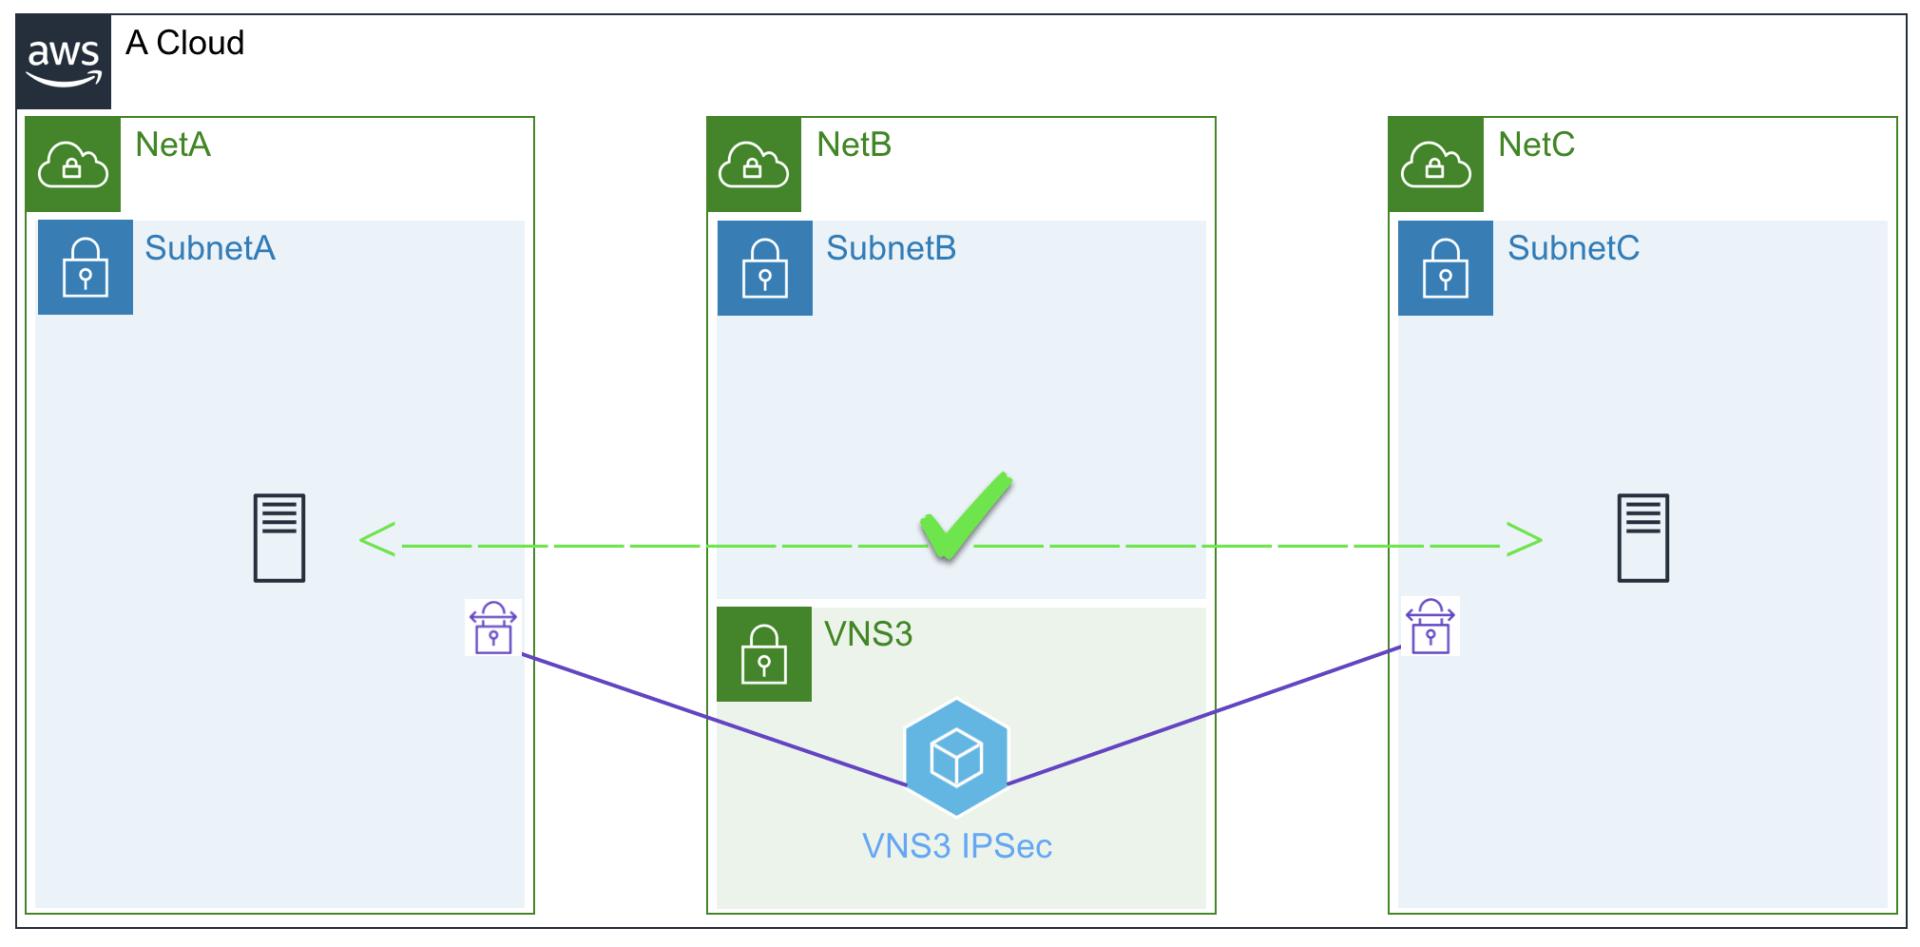 VNS3 Transit Ipsec deployment